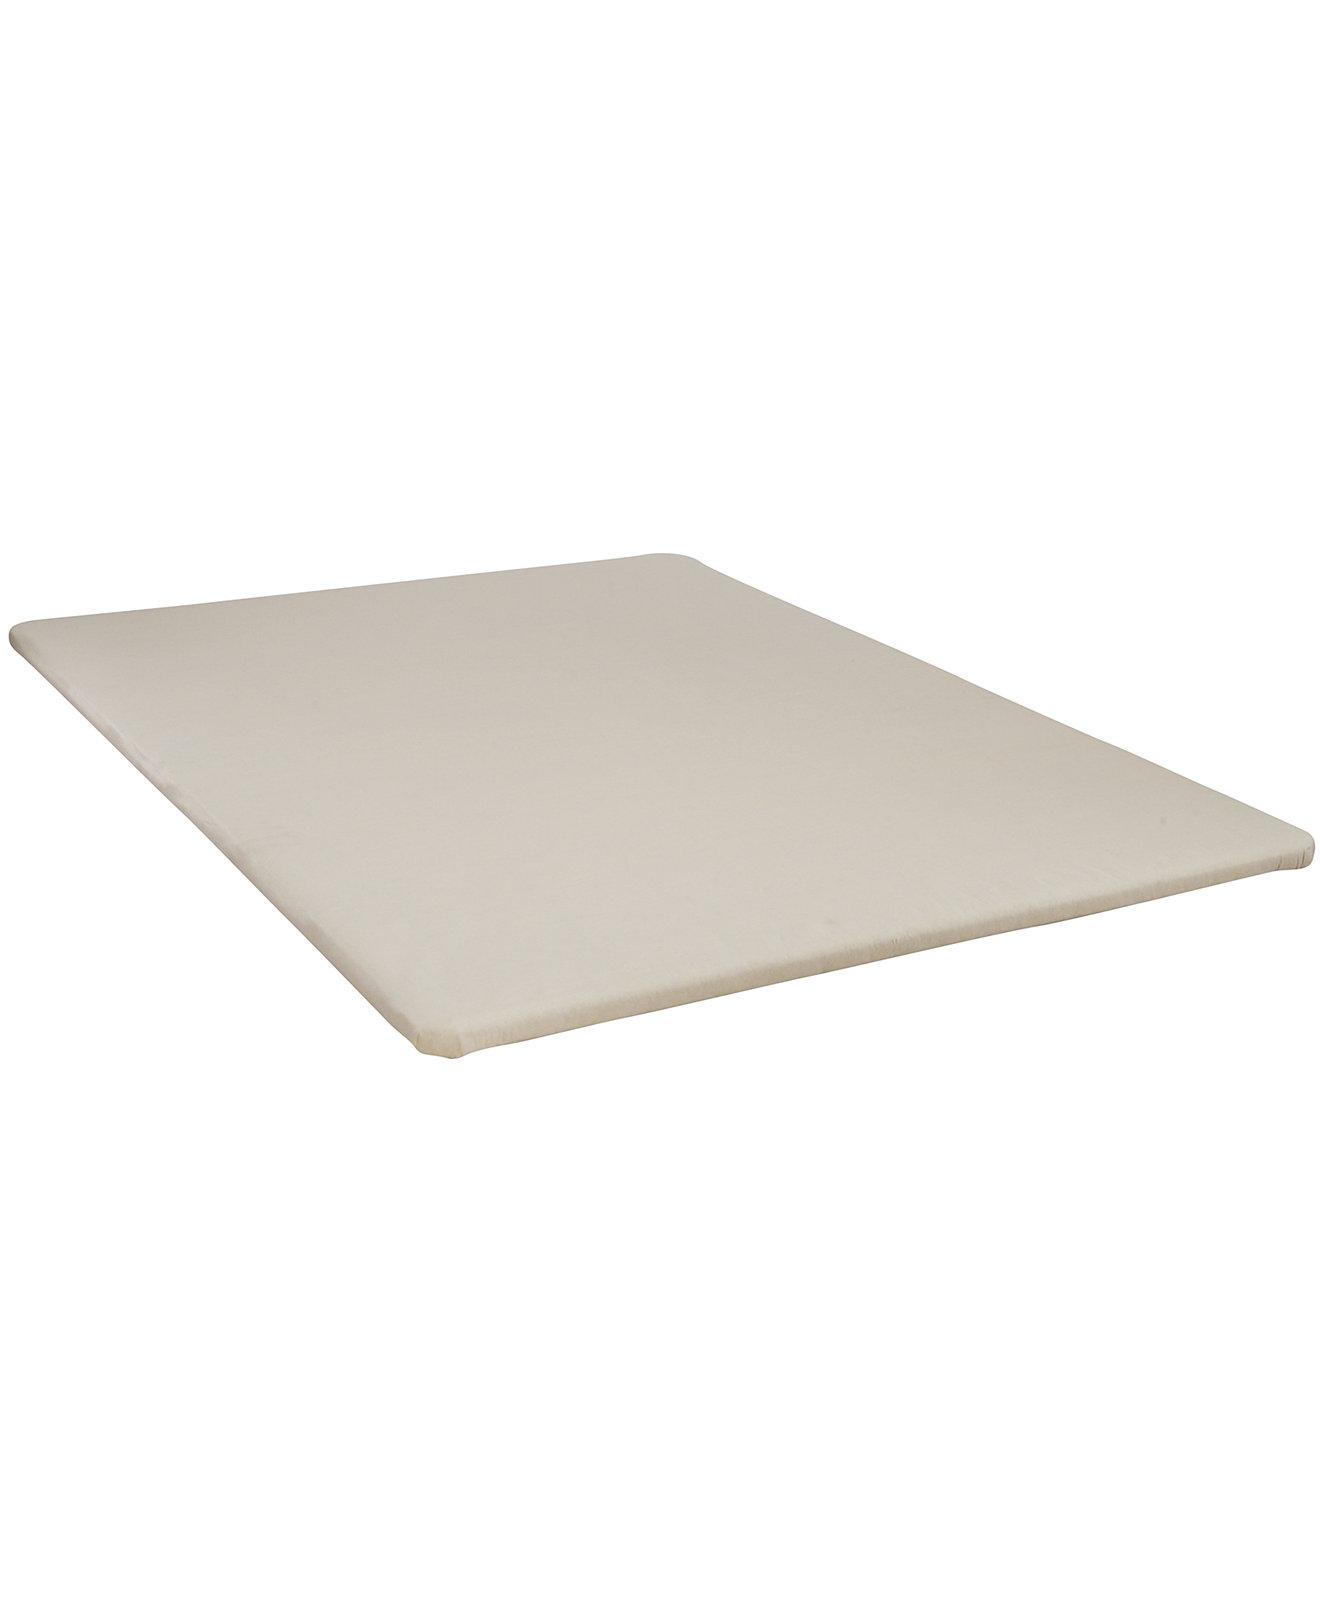 Serta Bunkie Boards